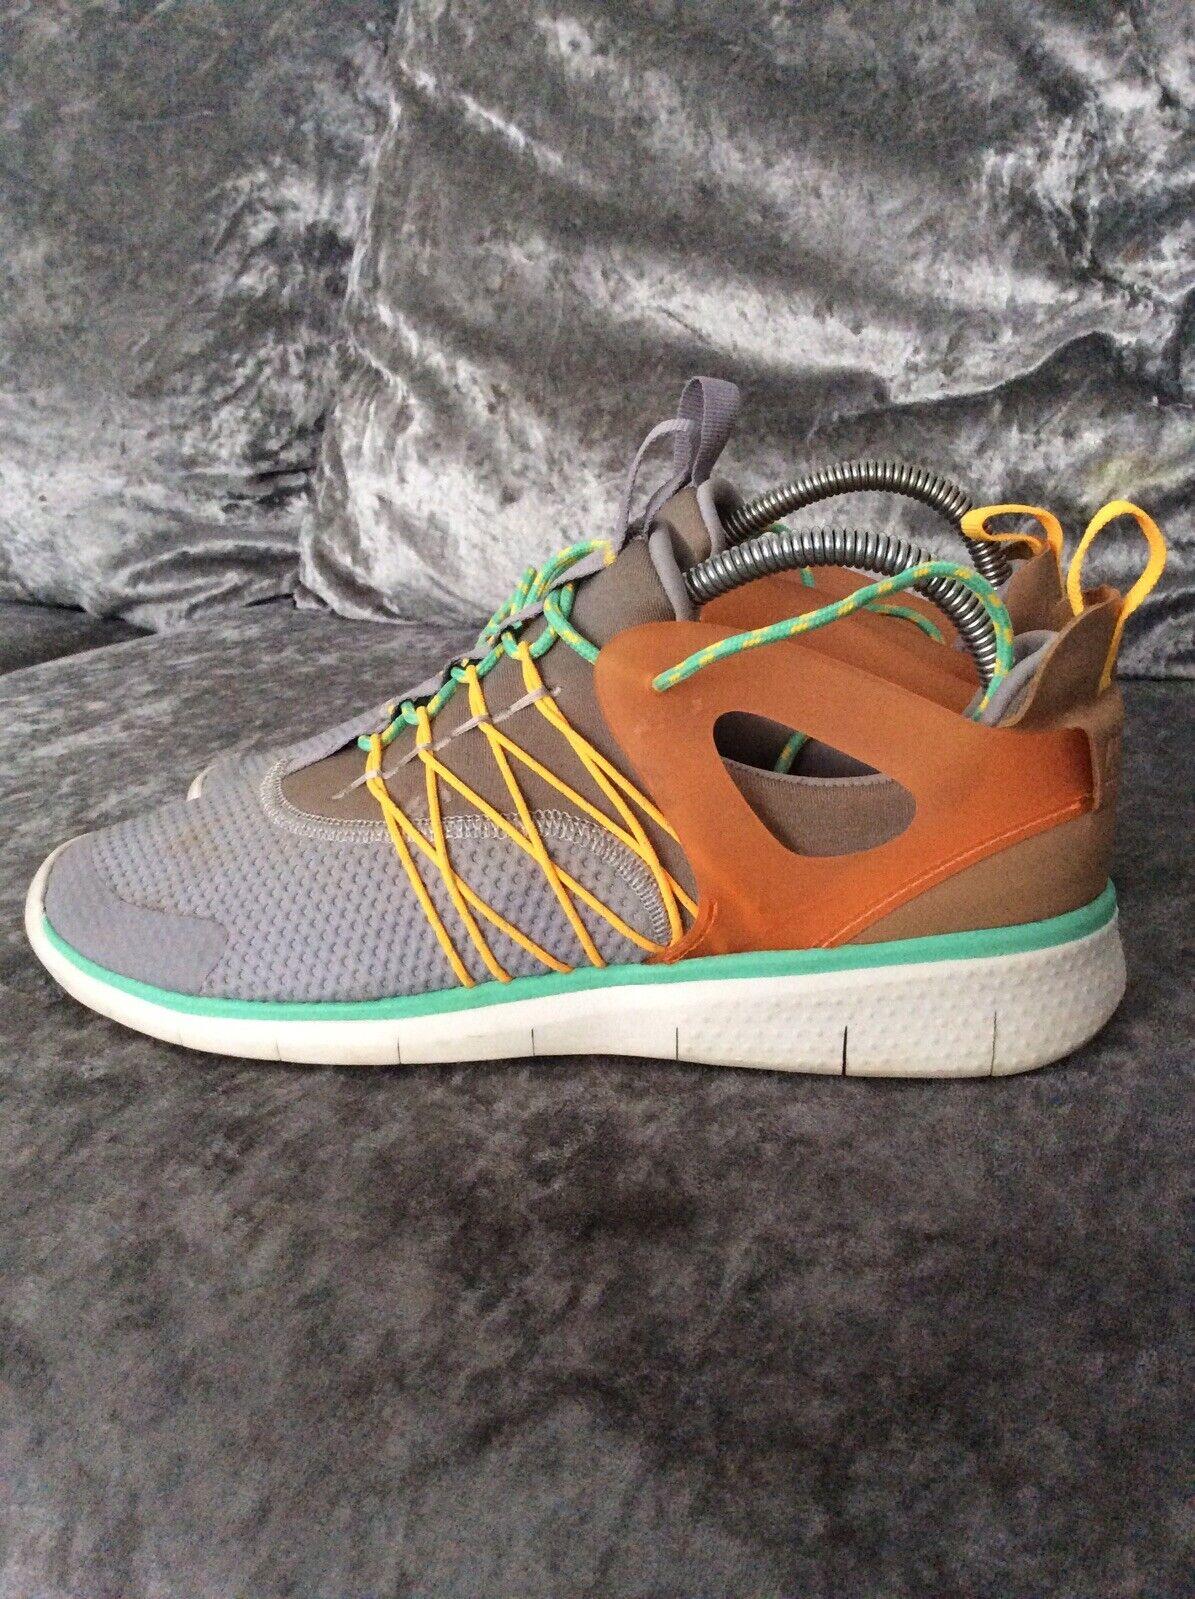 Femme Nike Free Viritous Gris Orange Baskets 725060 003 UK Taille 6 Très bon état